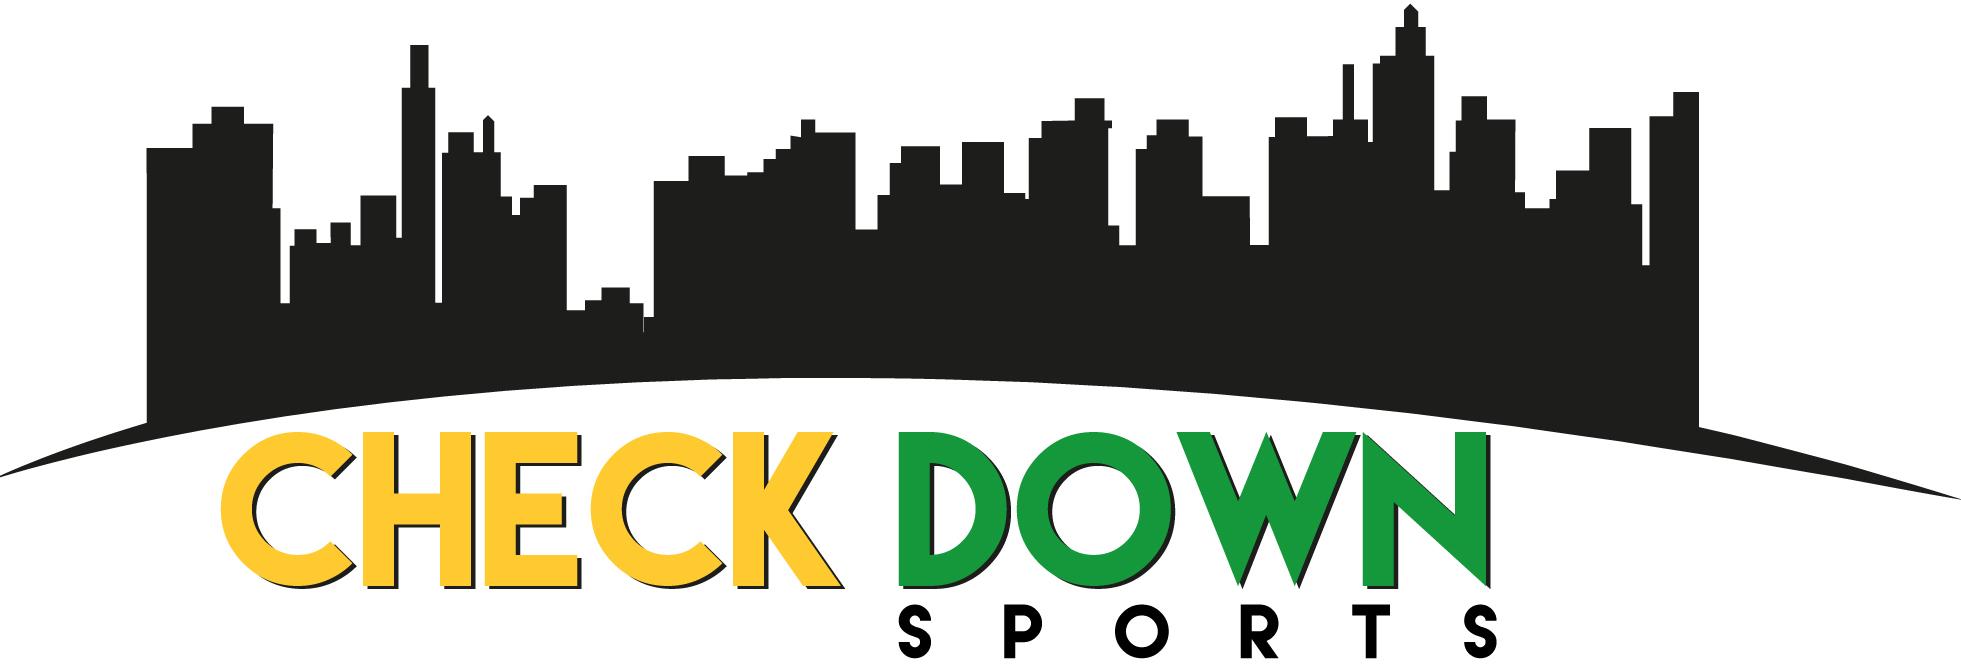 Check Down Sports